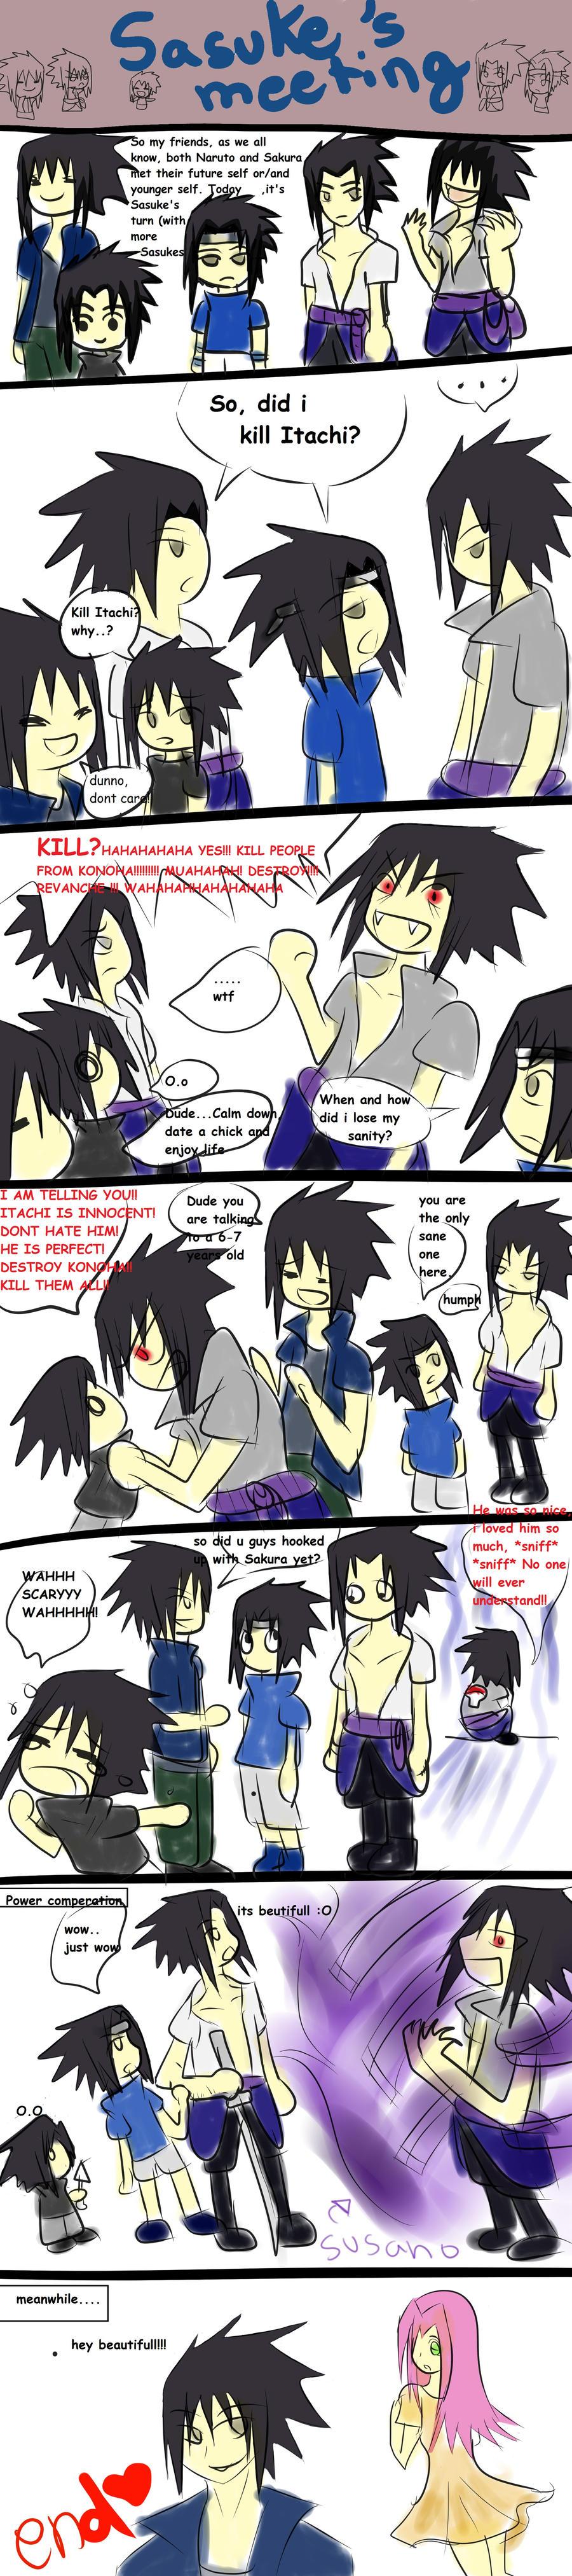 Sasuke's meeting by animeGirlRandom